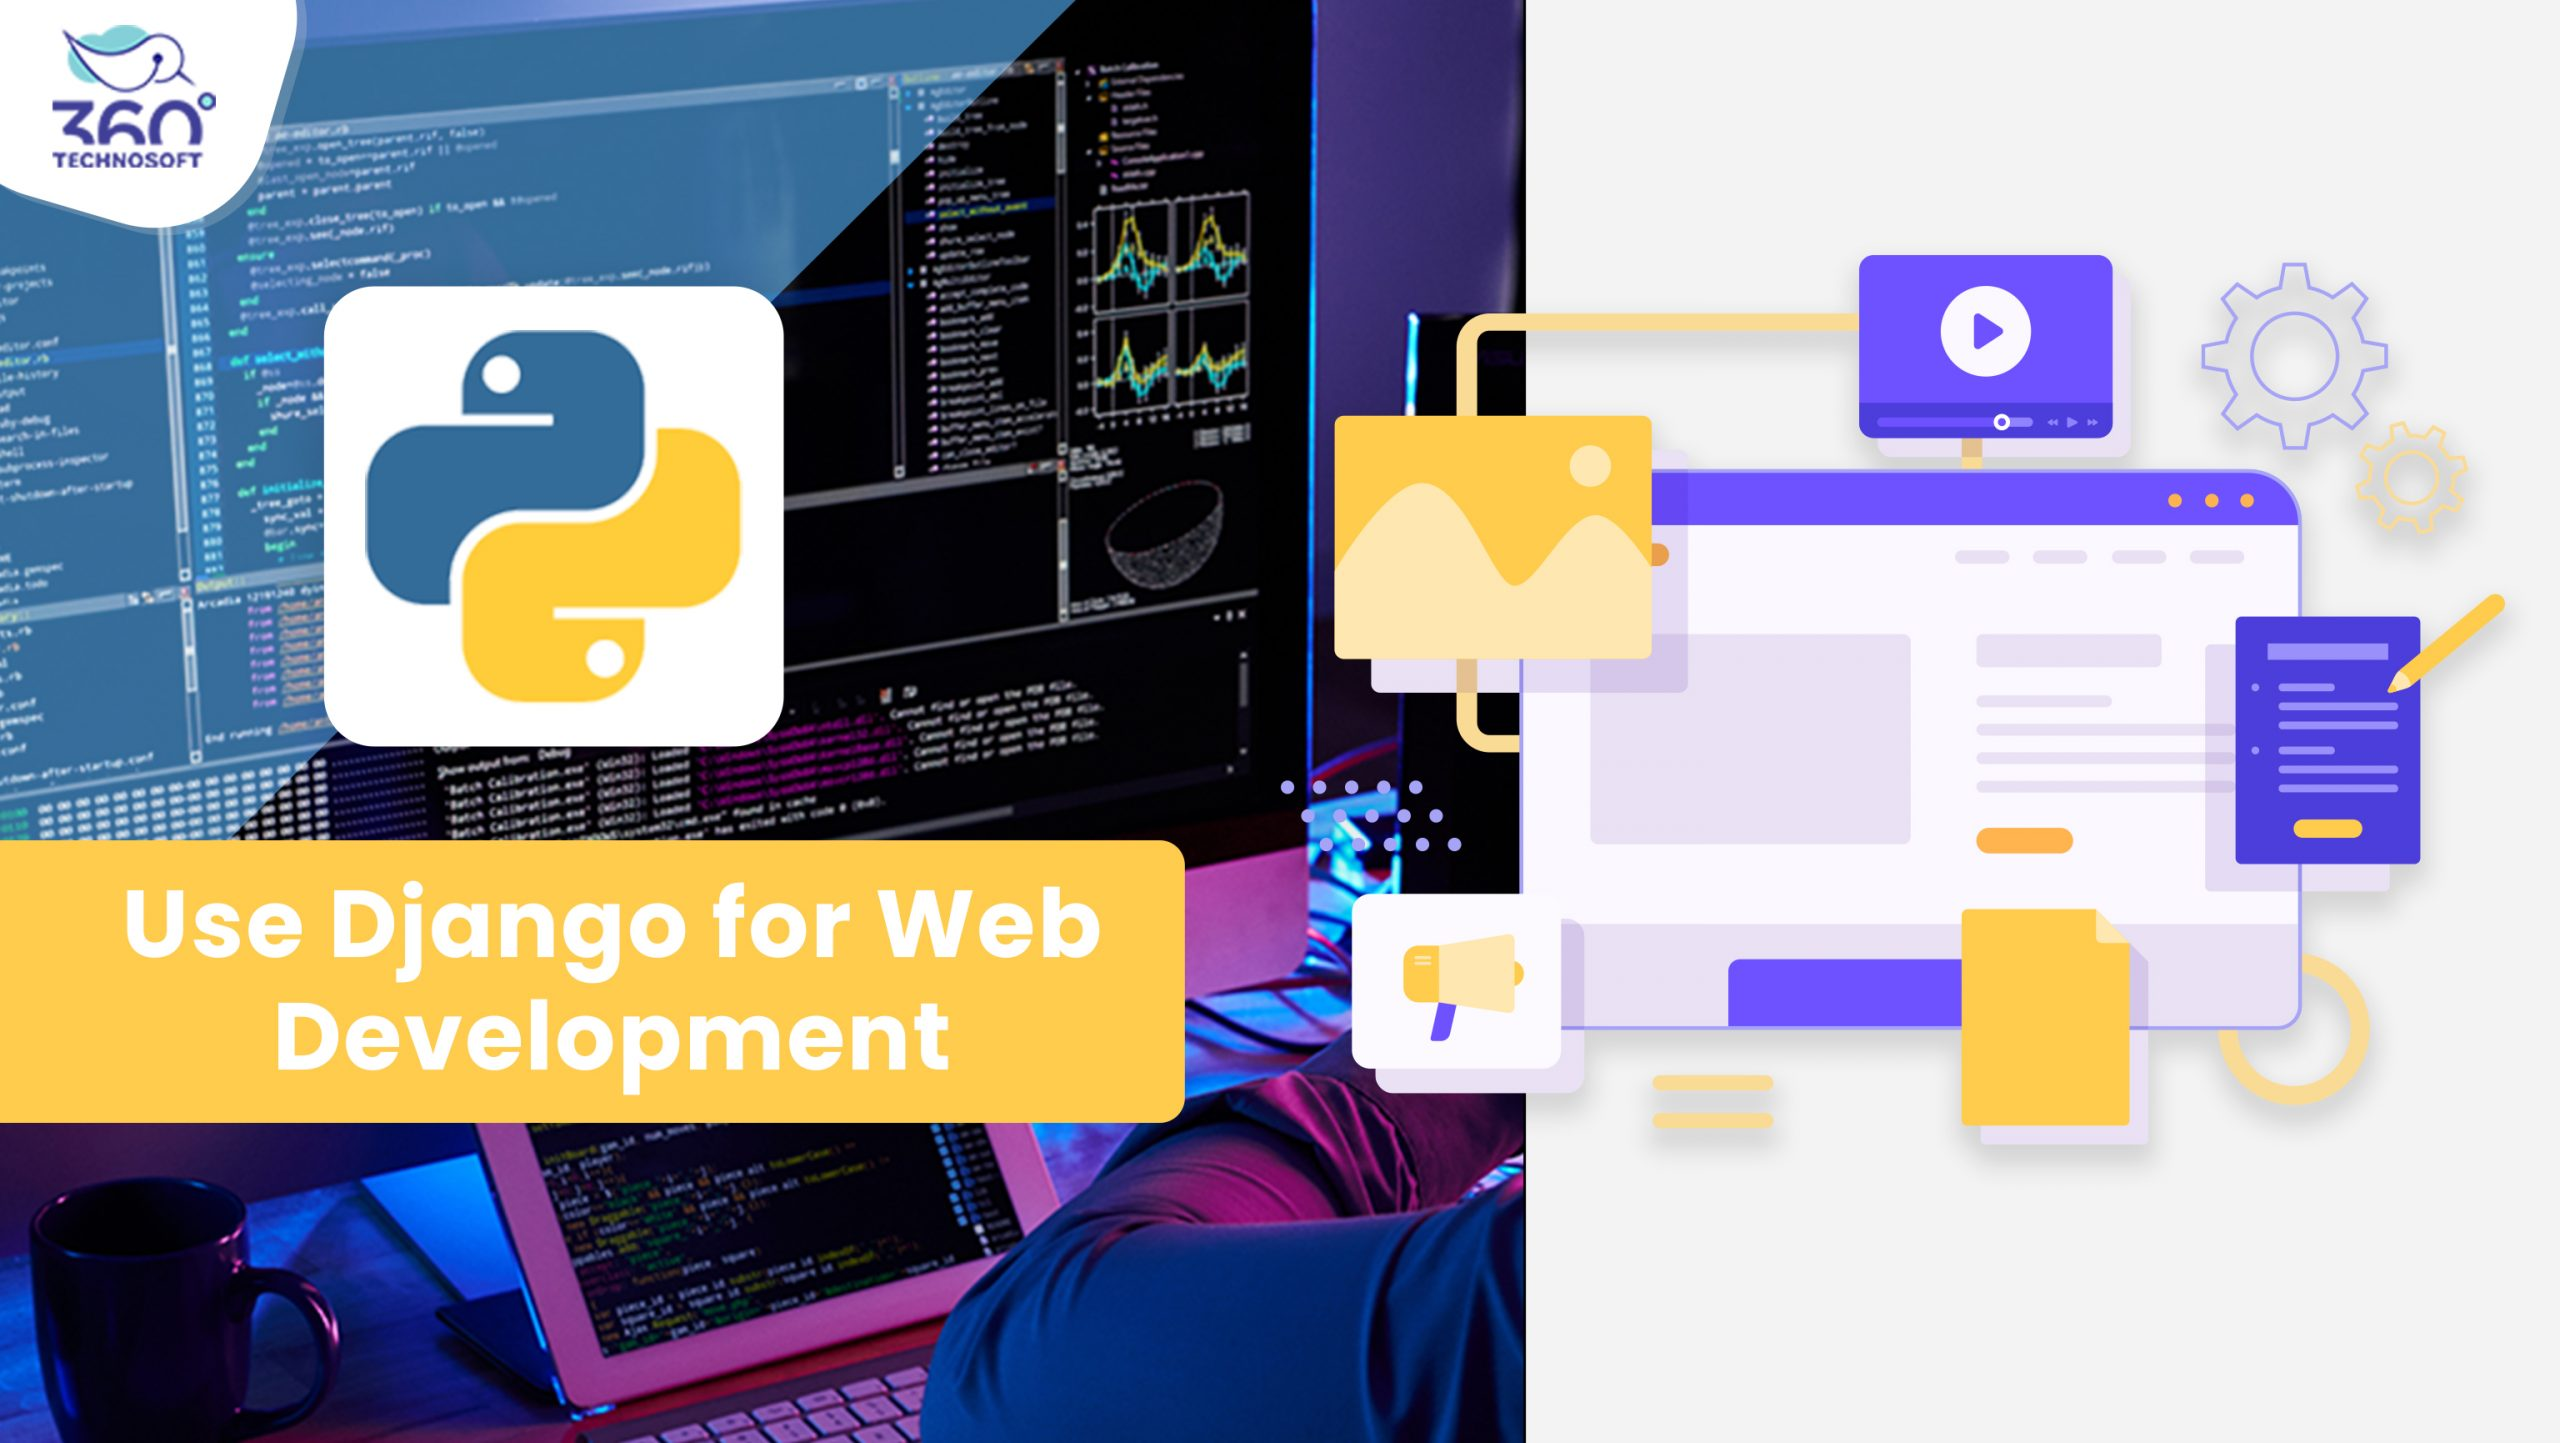 MTop Reasons to Use Django framework for Web Development Project